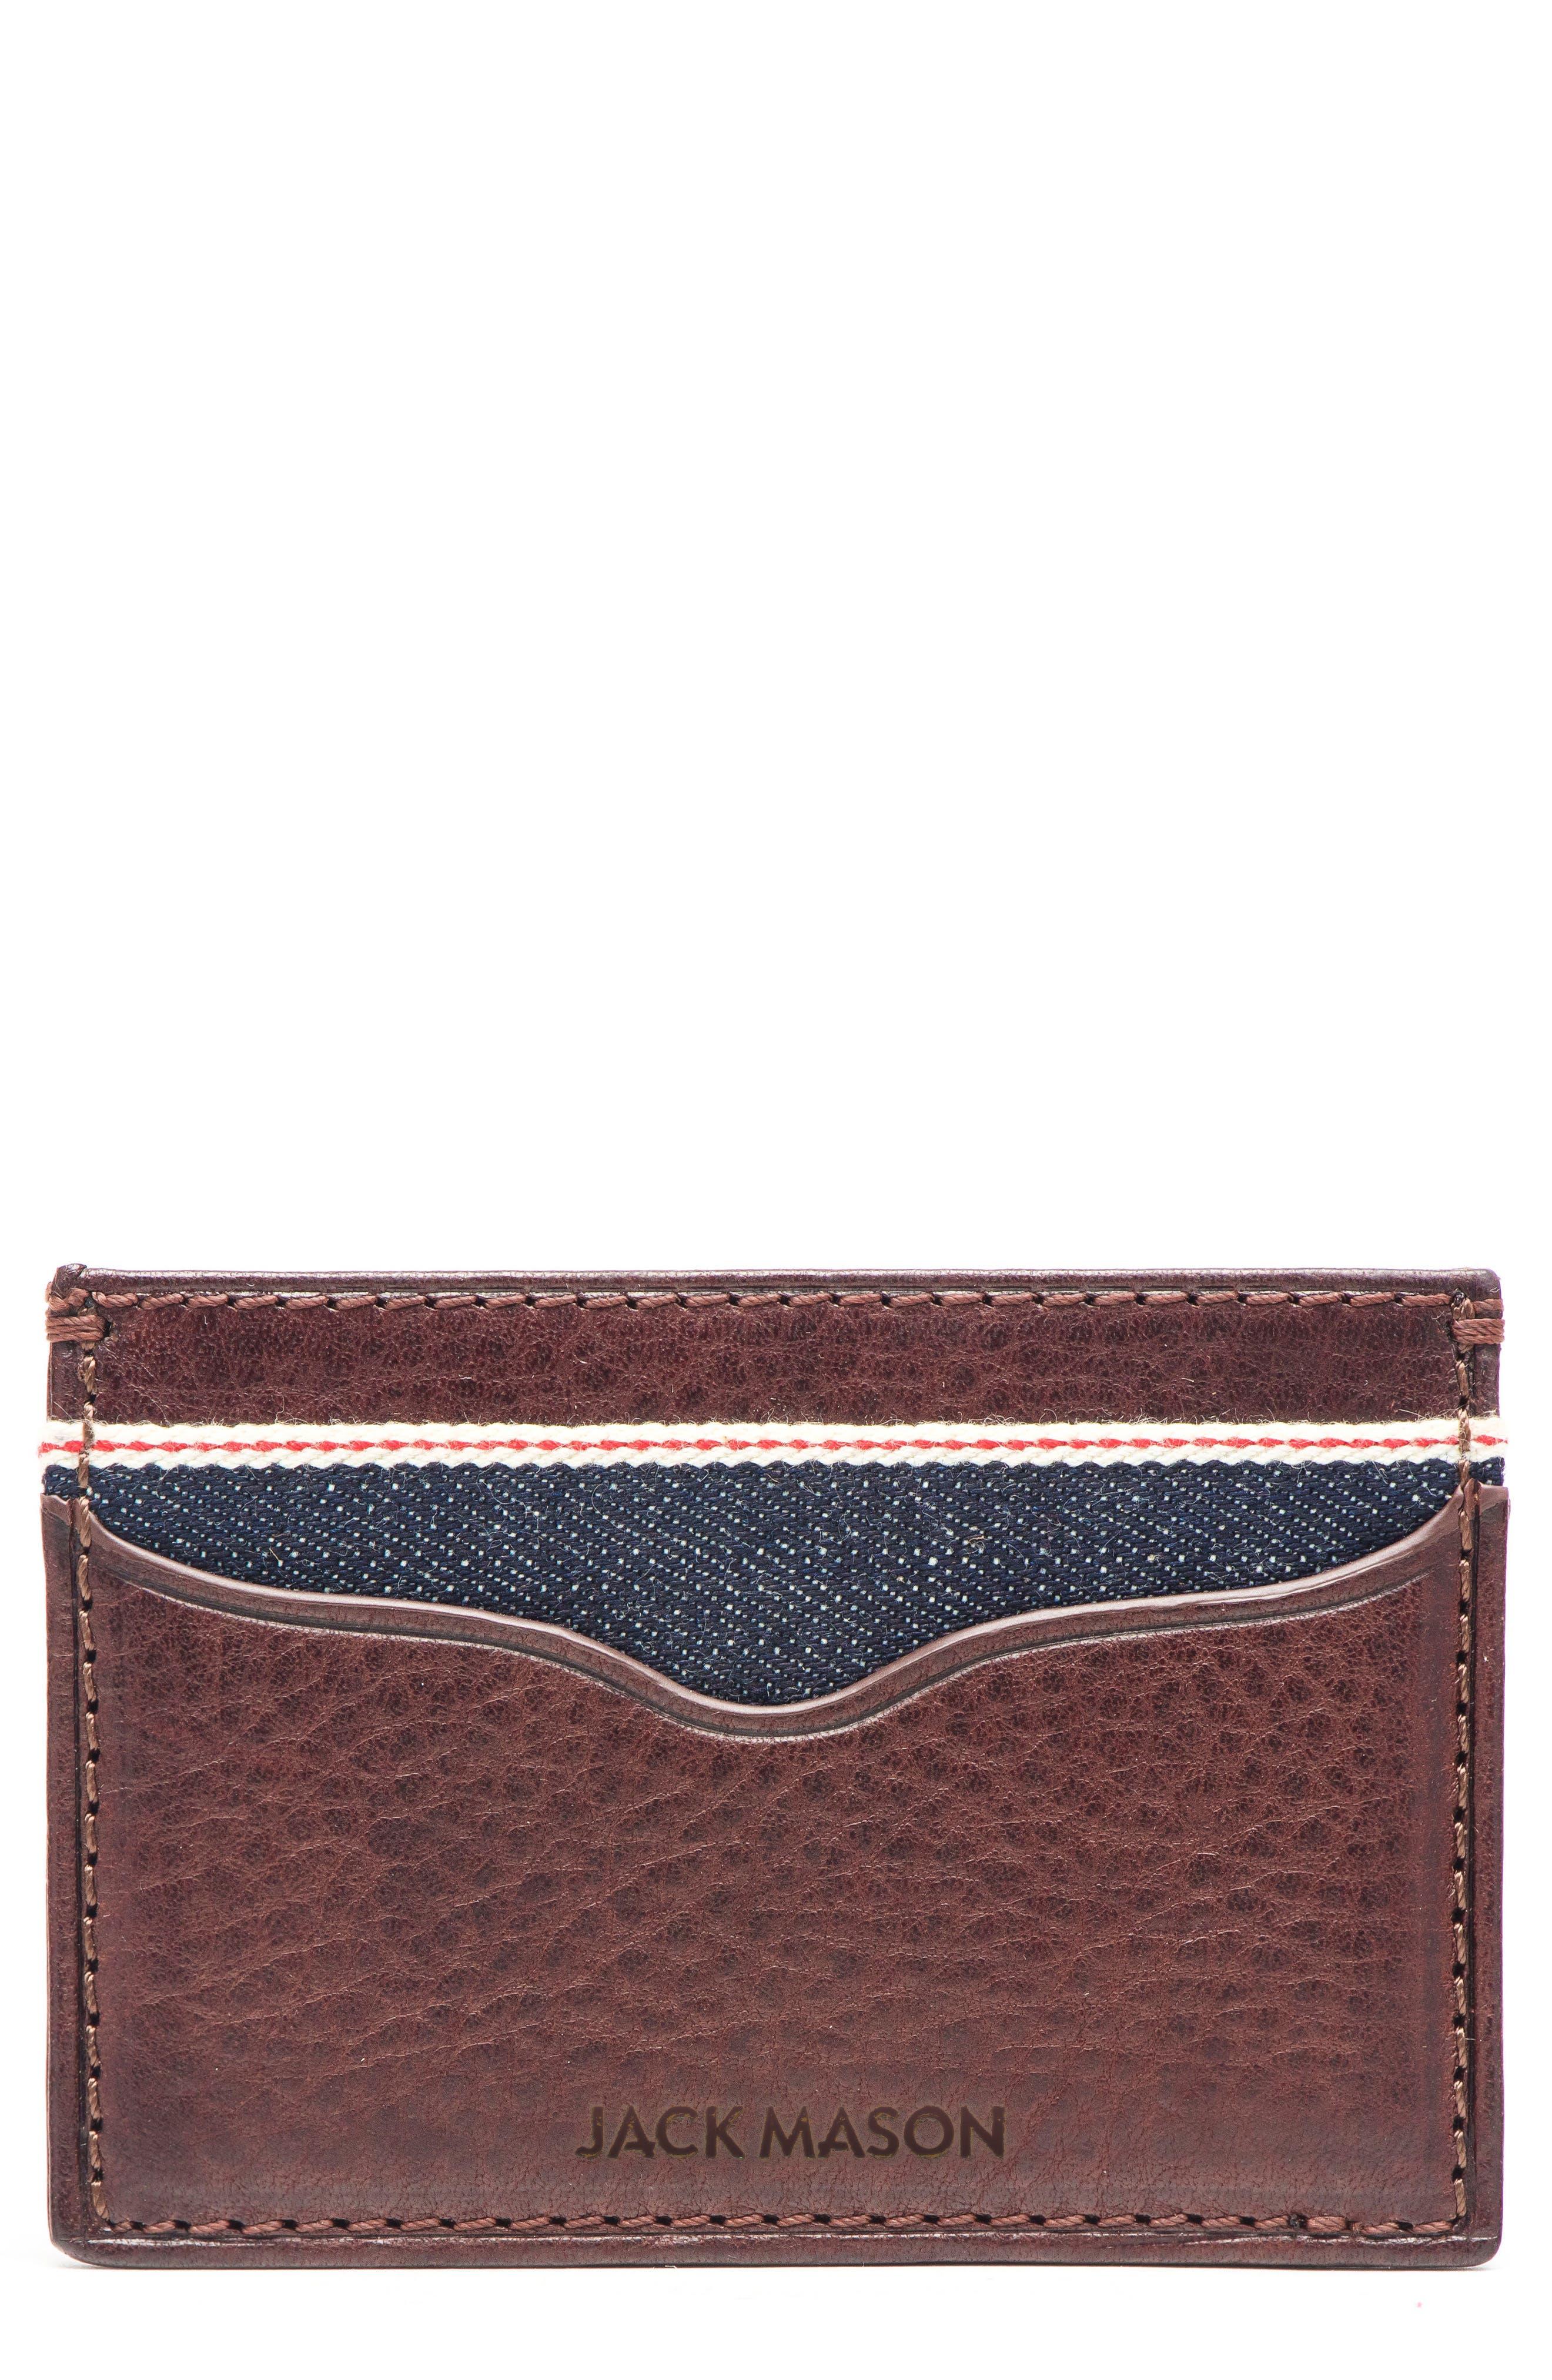 Leather & Denim Card Case,                             Main thumbnail 1, color,